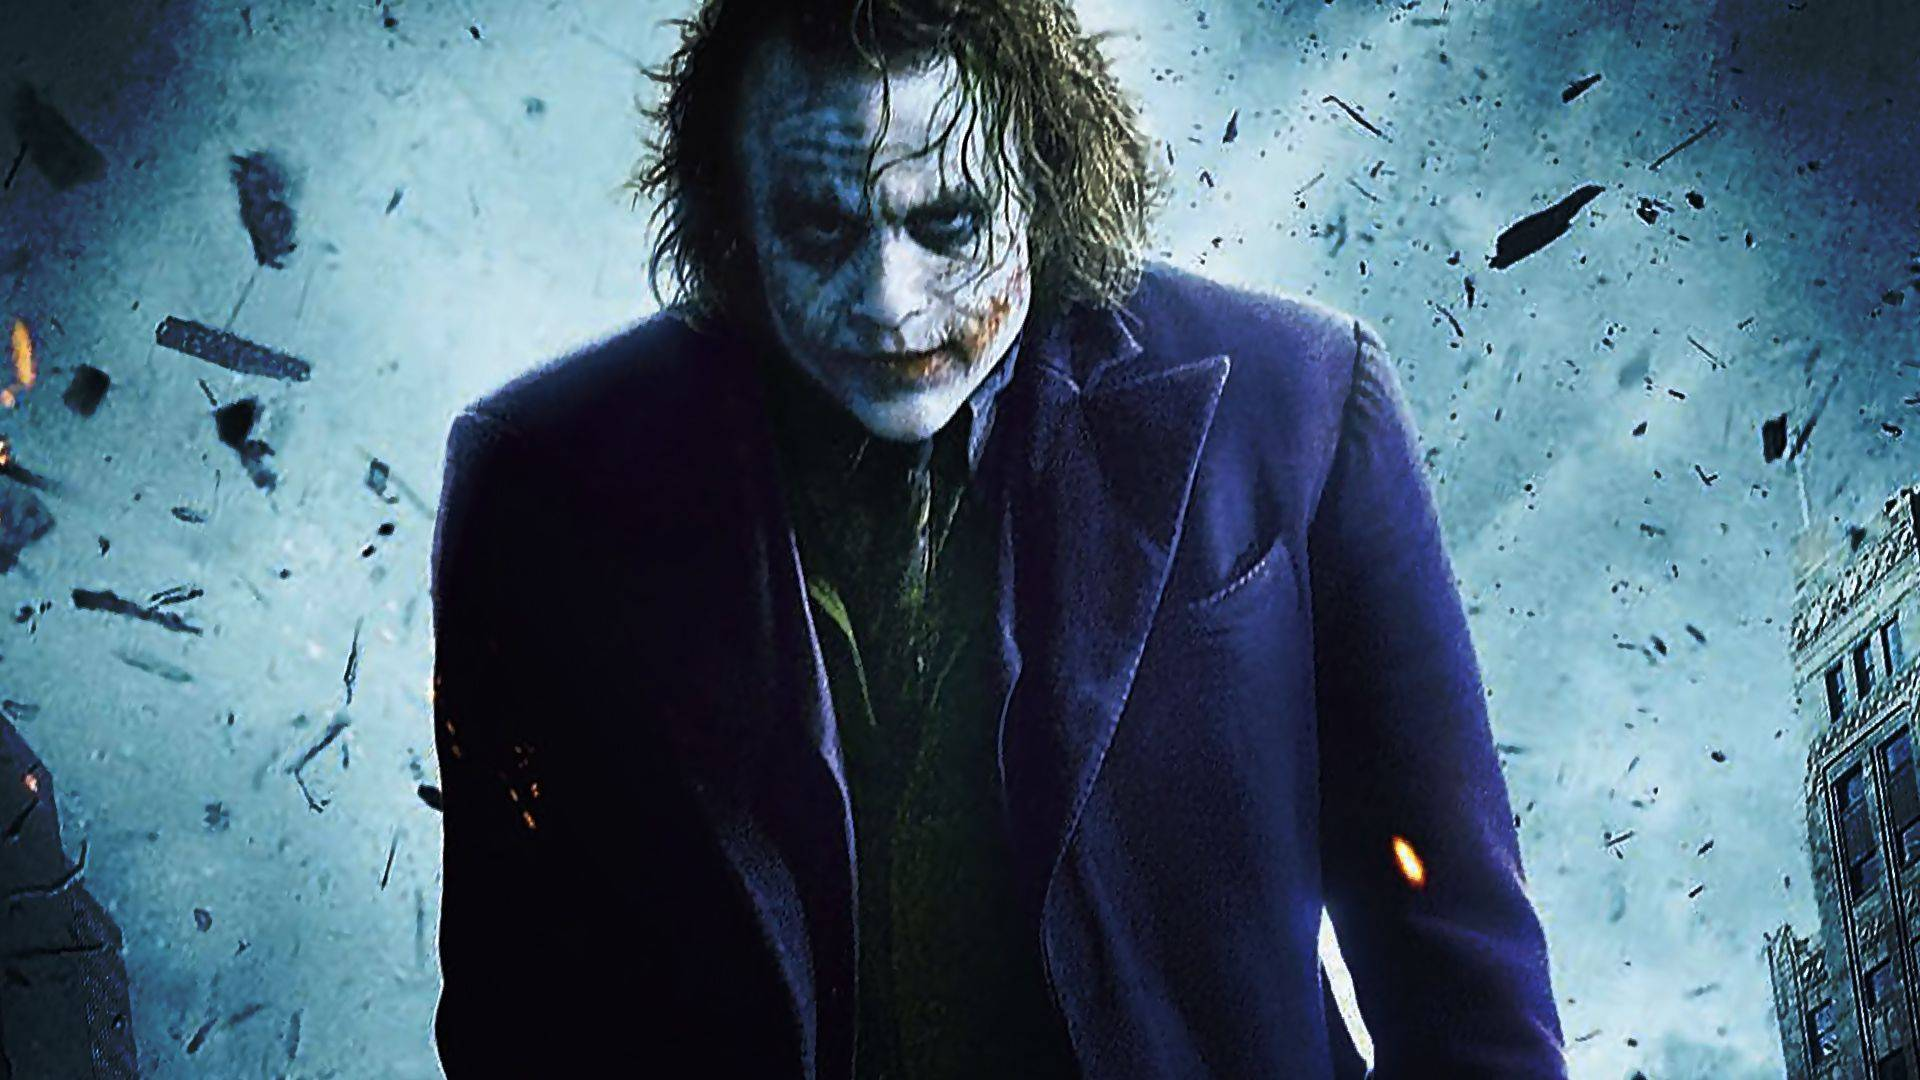 The Joker The Dark Knight   Heath Ledger   Batman Wallpaper 1920x1080